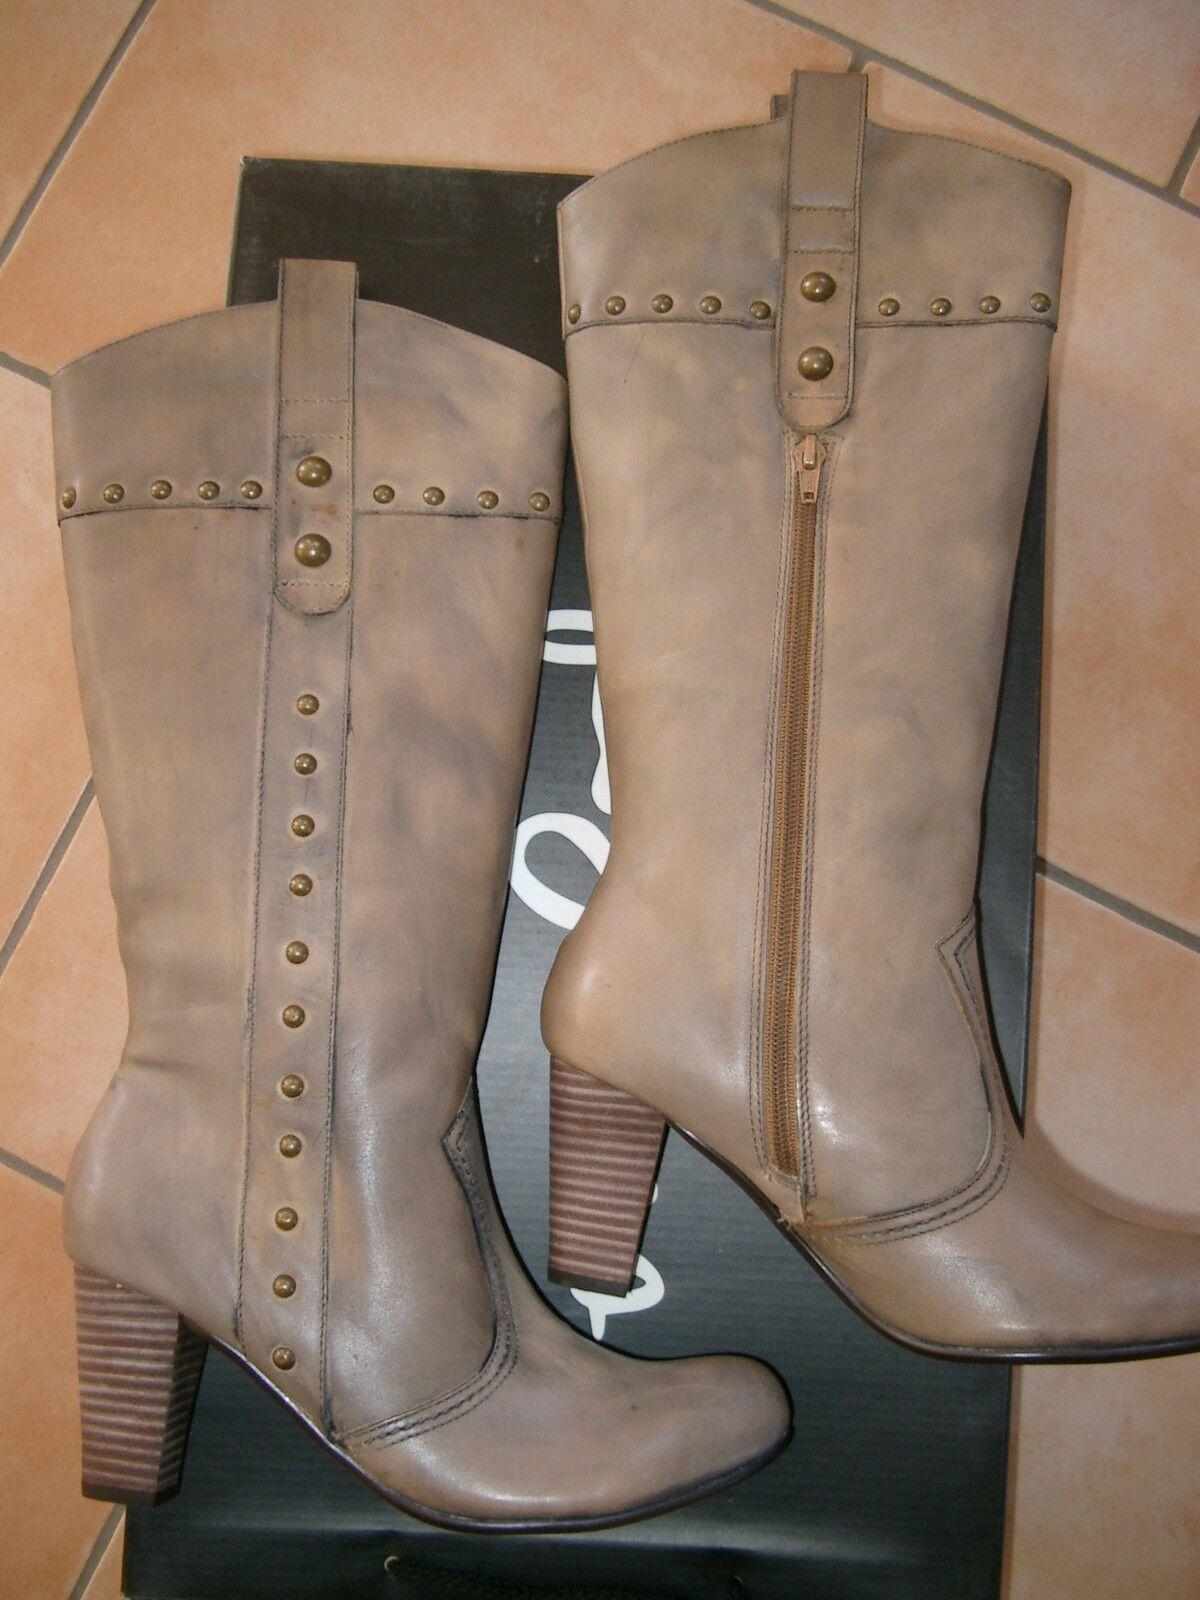 (Z36) Pepe Jeans Damen Schuhe Leder Stiefel im Western Style mit Nieten gr.41